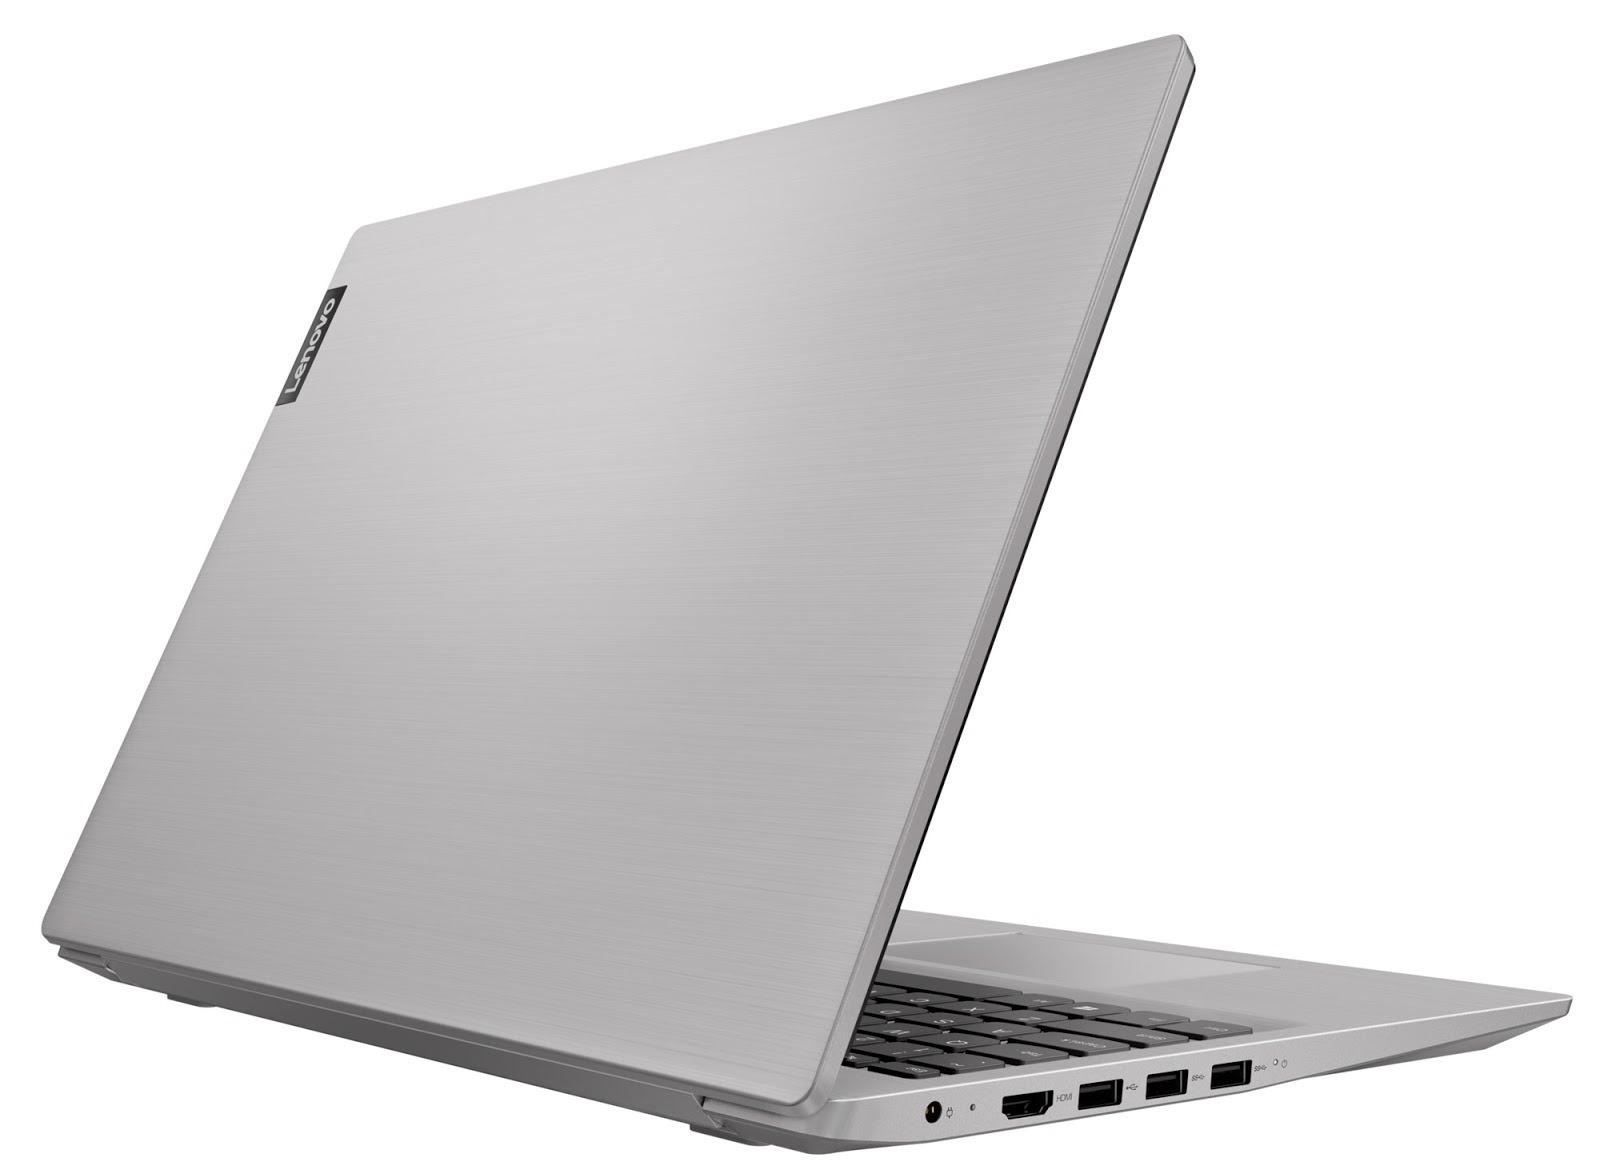 Фото 2. Ноутбук Lenovo ideapad S145-15IGM Platinum Grey (81MX001KRE)